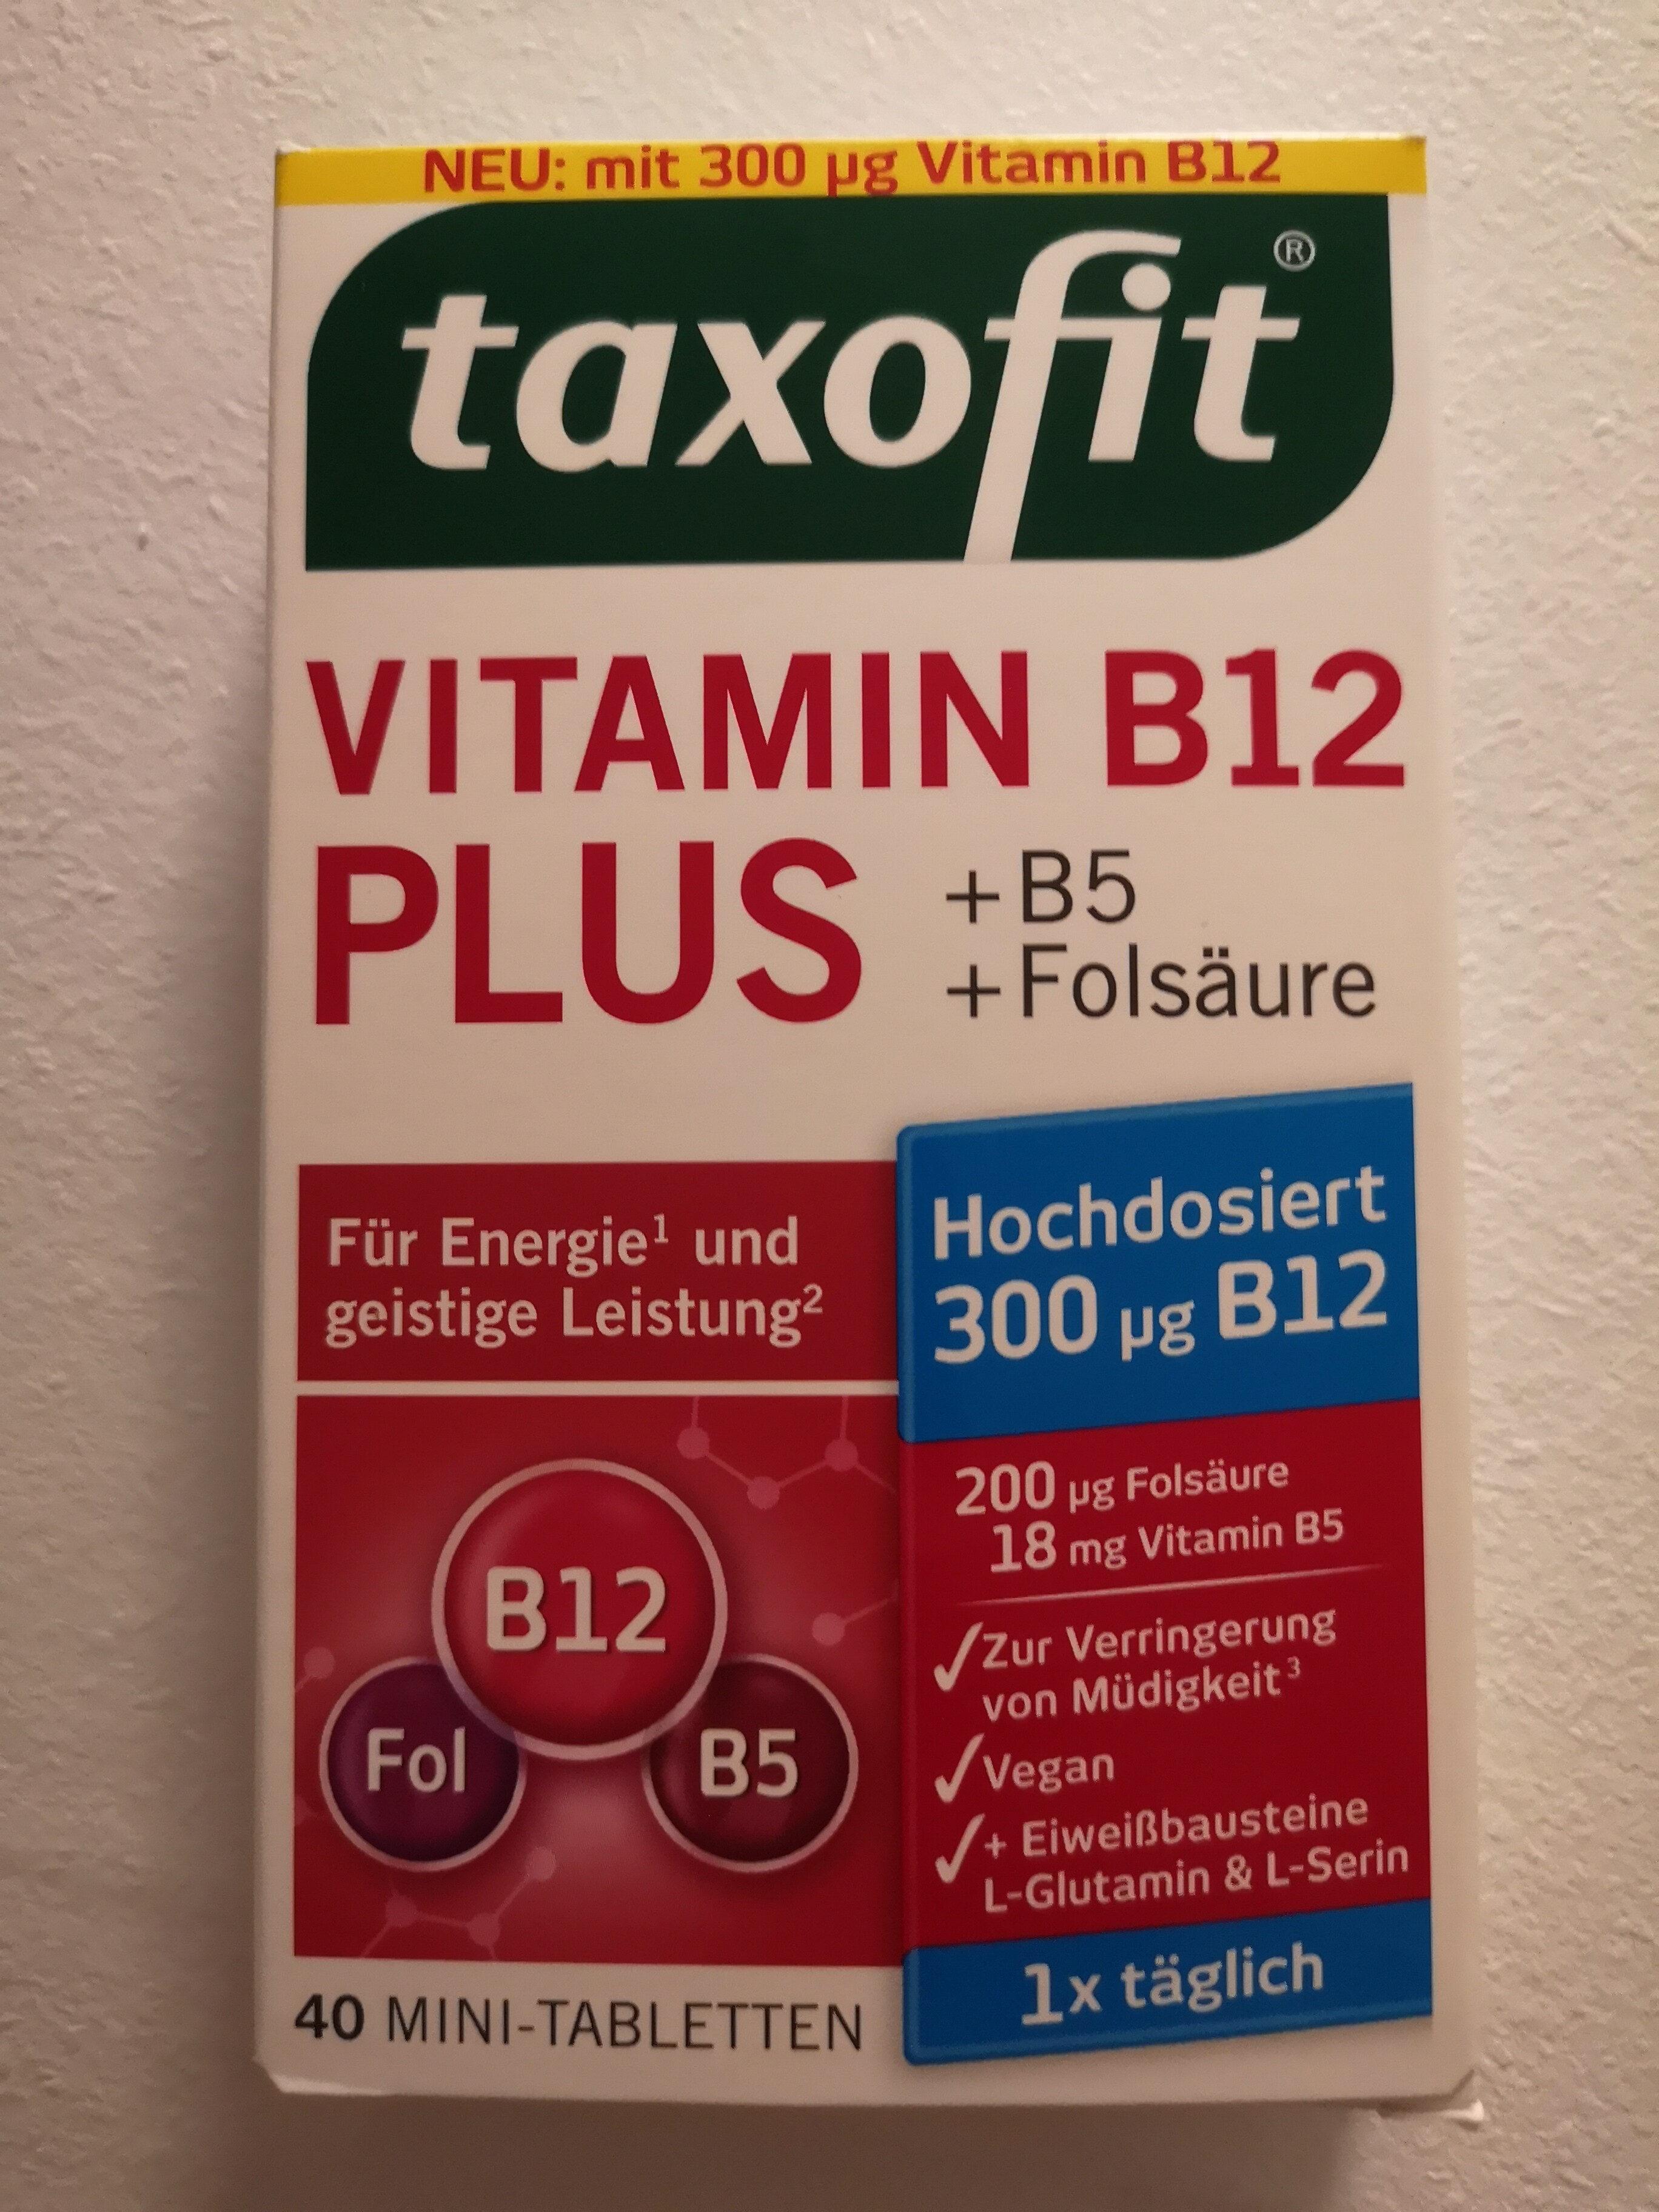 Vitamin B12 Plus +B5 +Folsäure - Producto - de